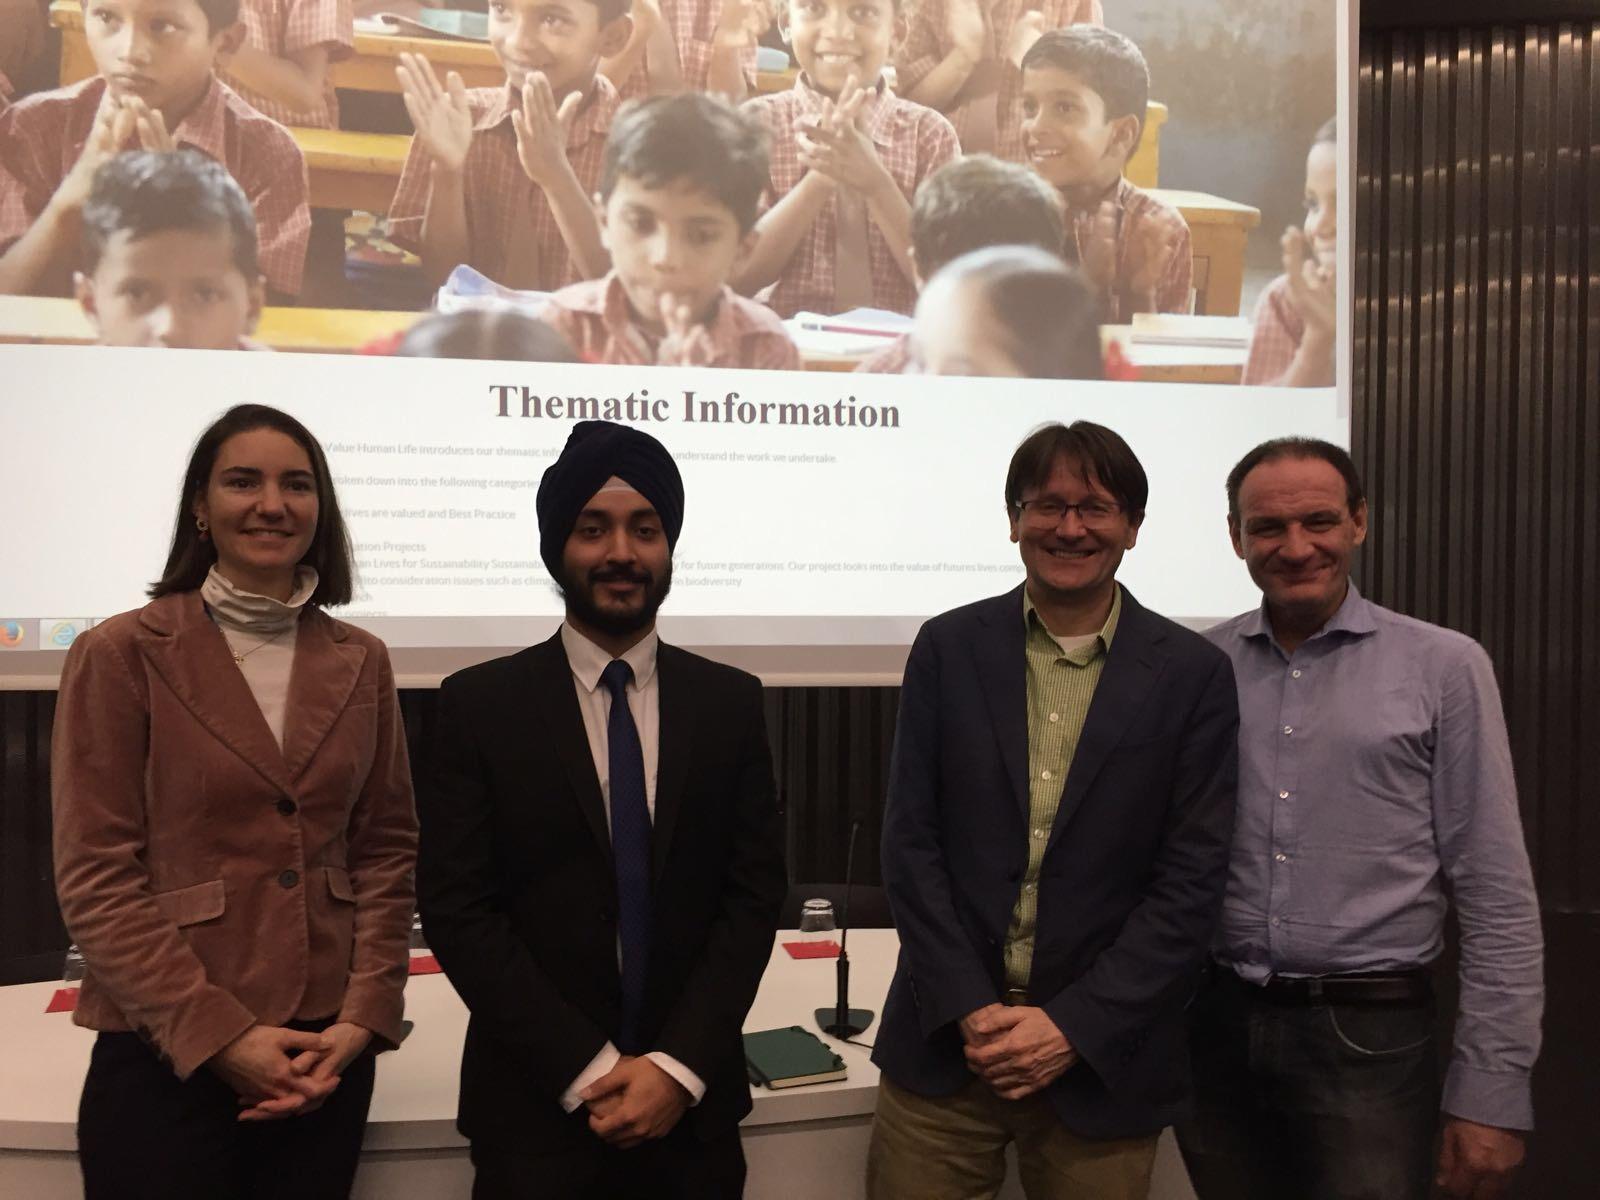 Jaspreet Singh (ESD 14-15) Initiative to Value Human Life